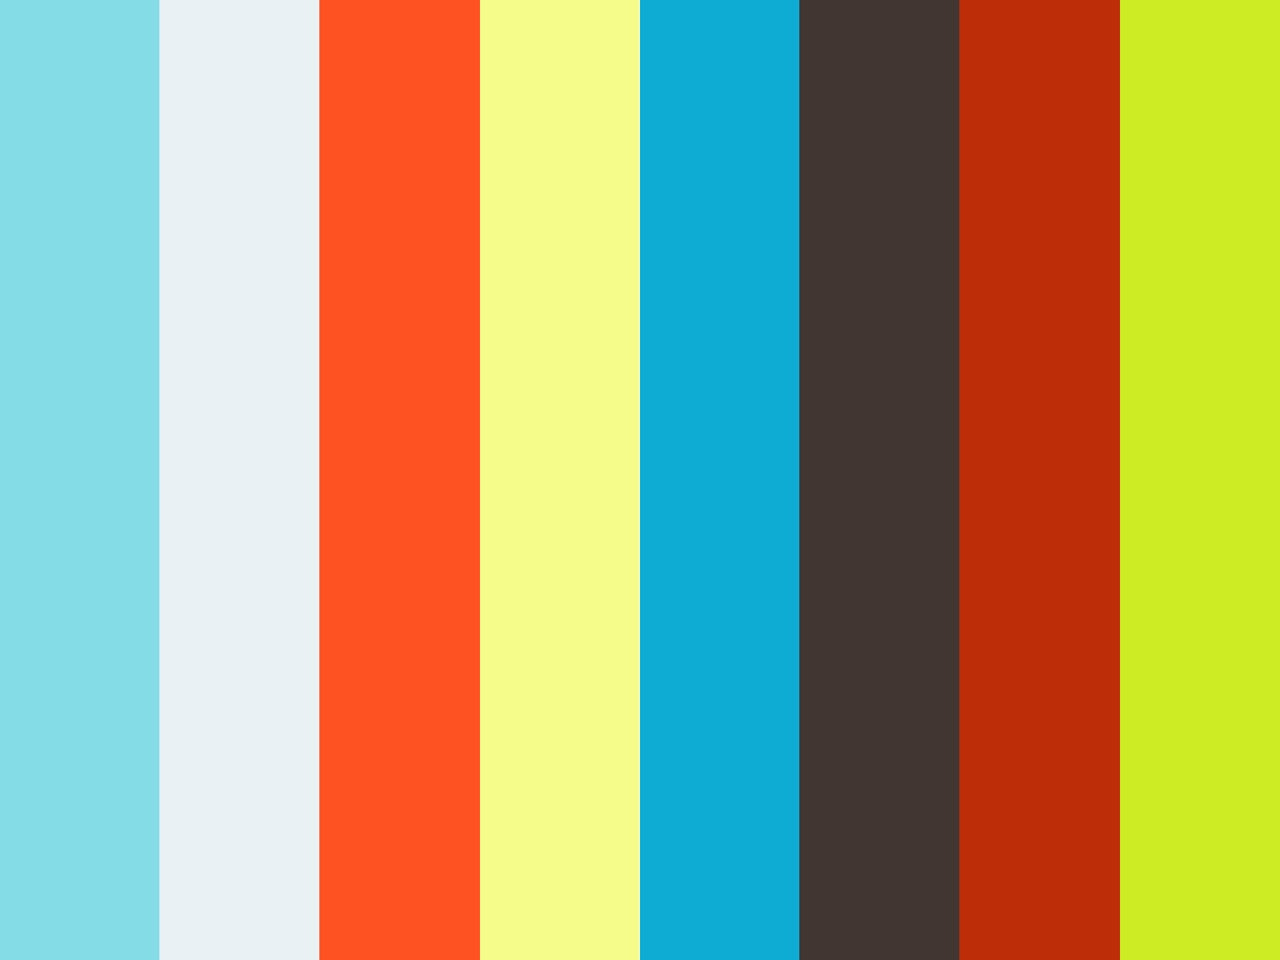 Arduino LCD Spectrum Analyzer from John Boxall on Vimeo